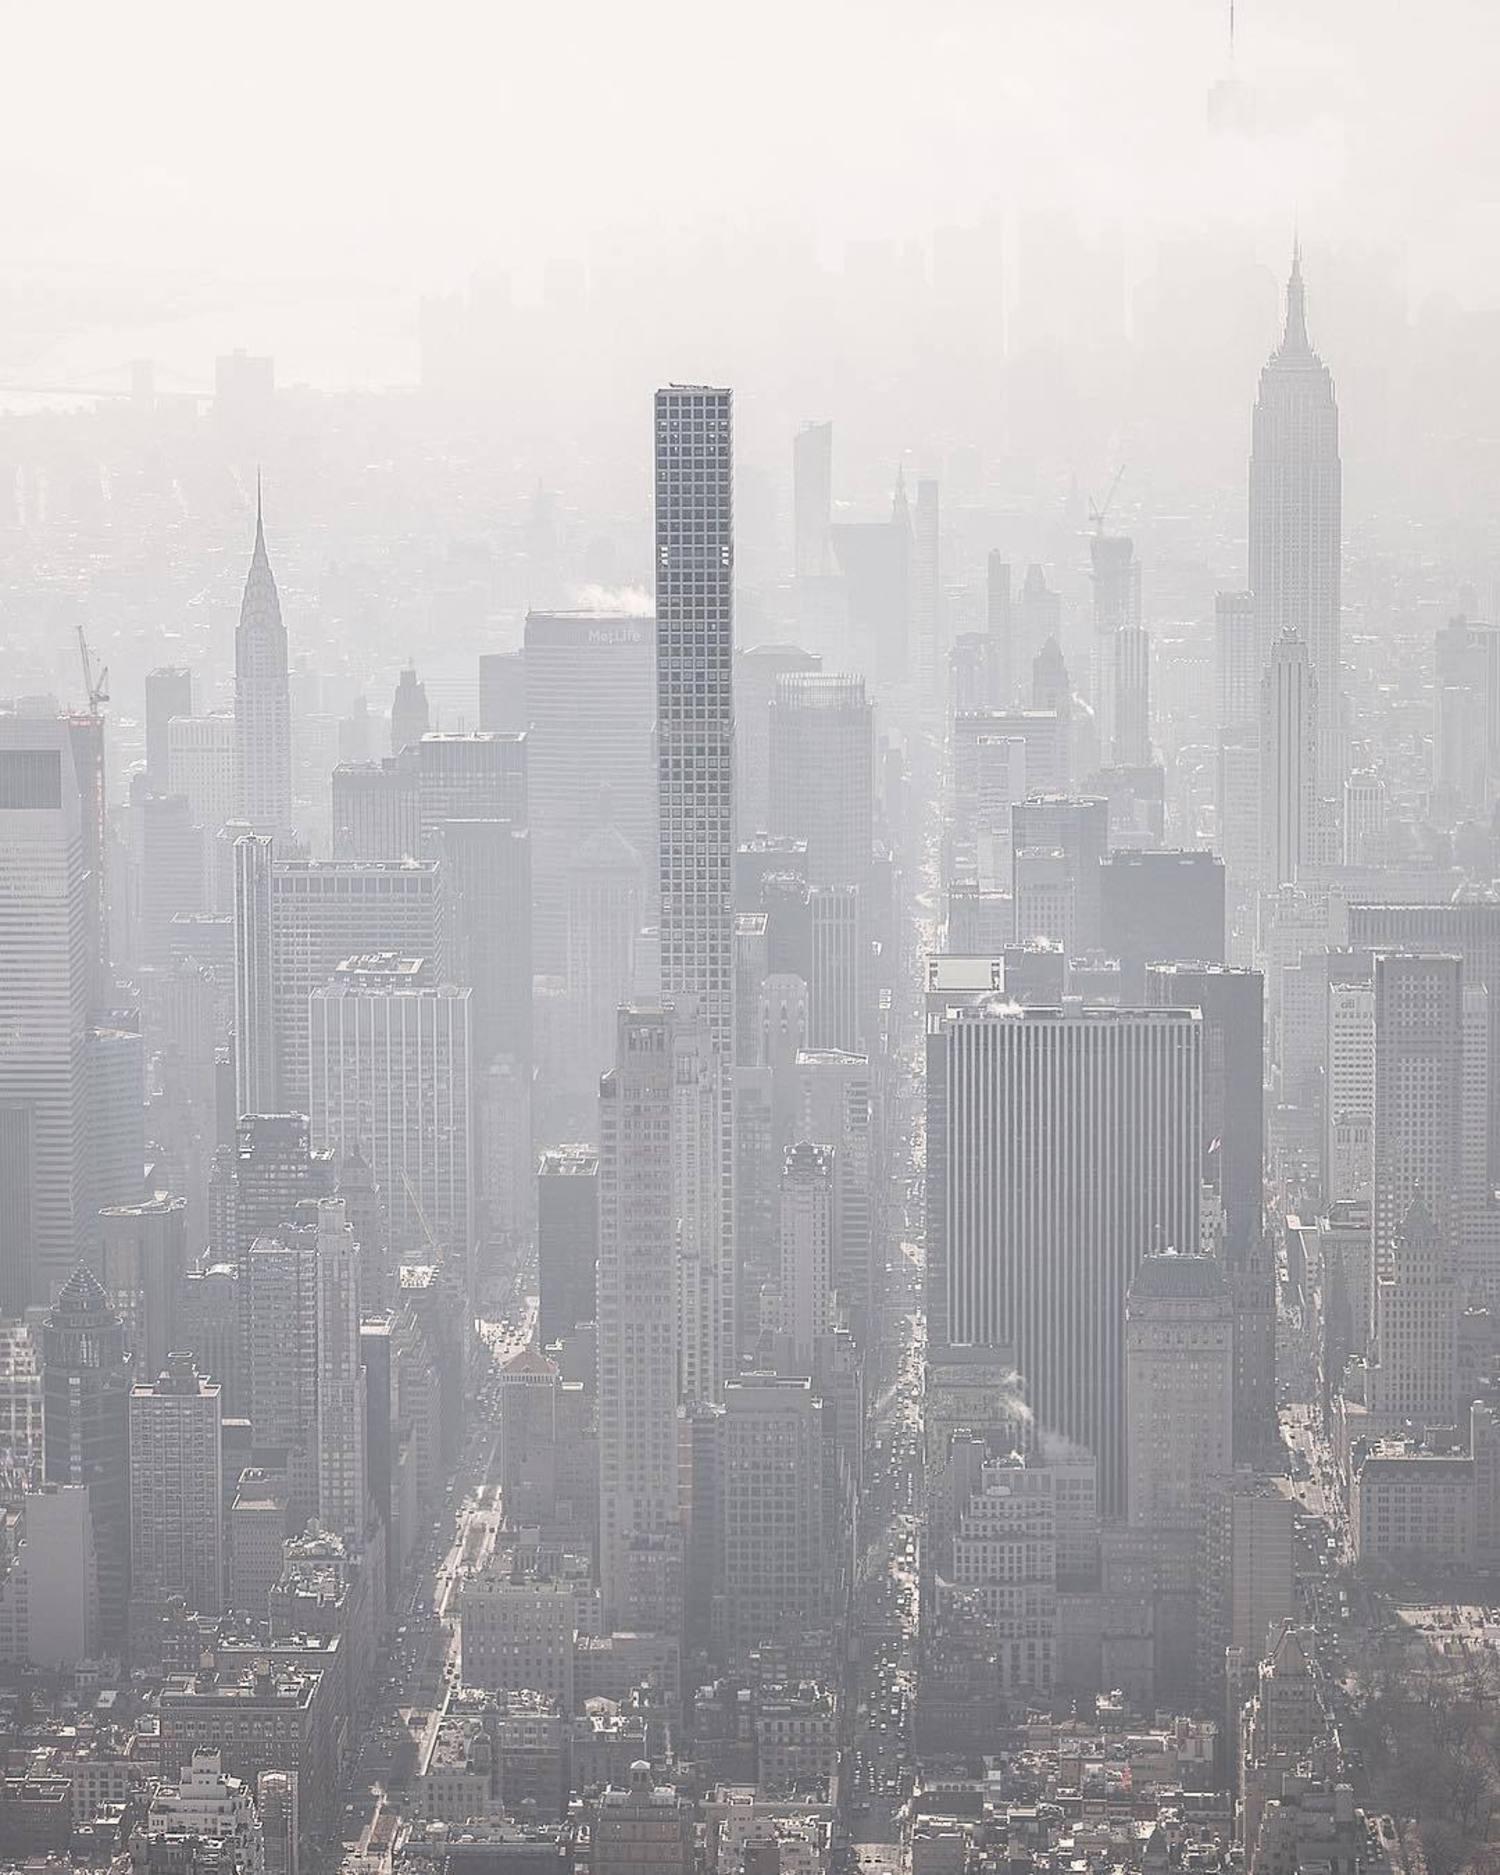 New York, New York. Photo via @cheryl.hills #viewingnyc #nyc #newyork #newyorkcity